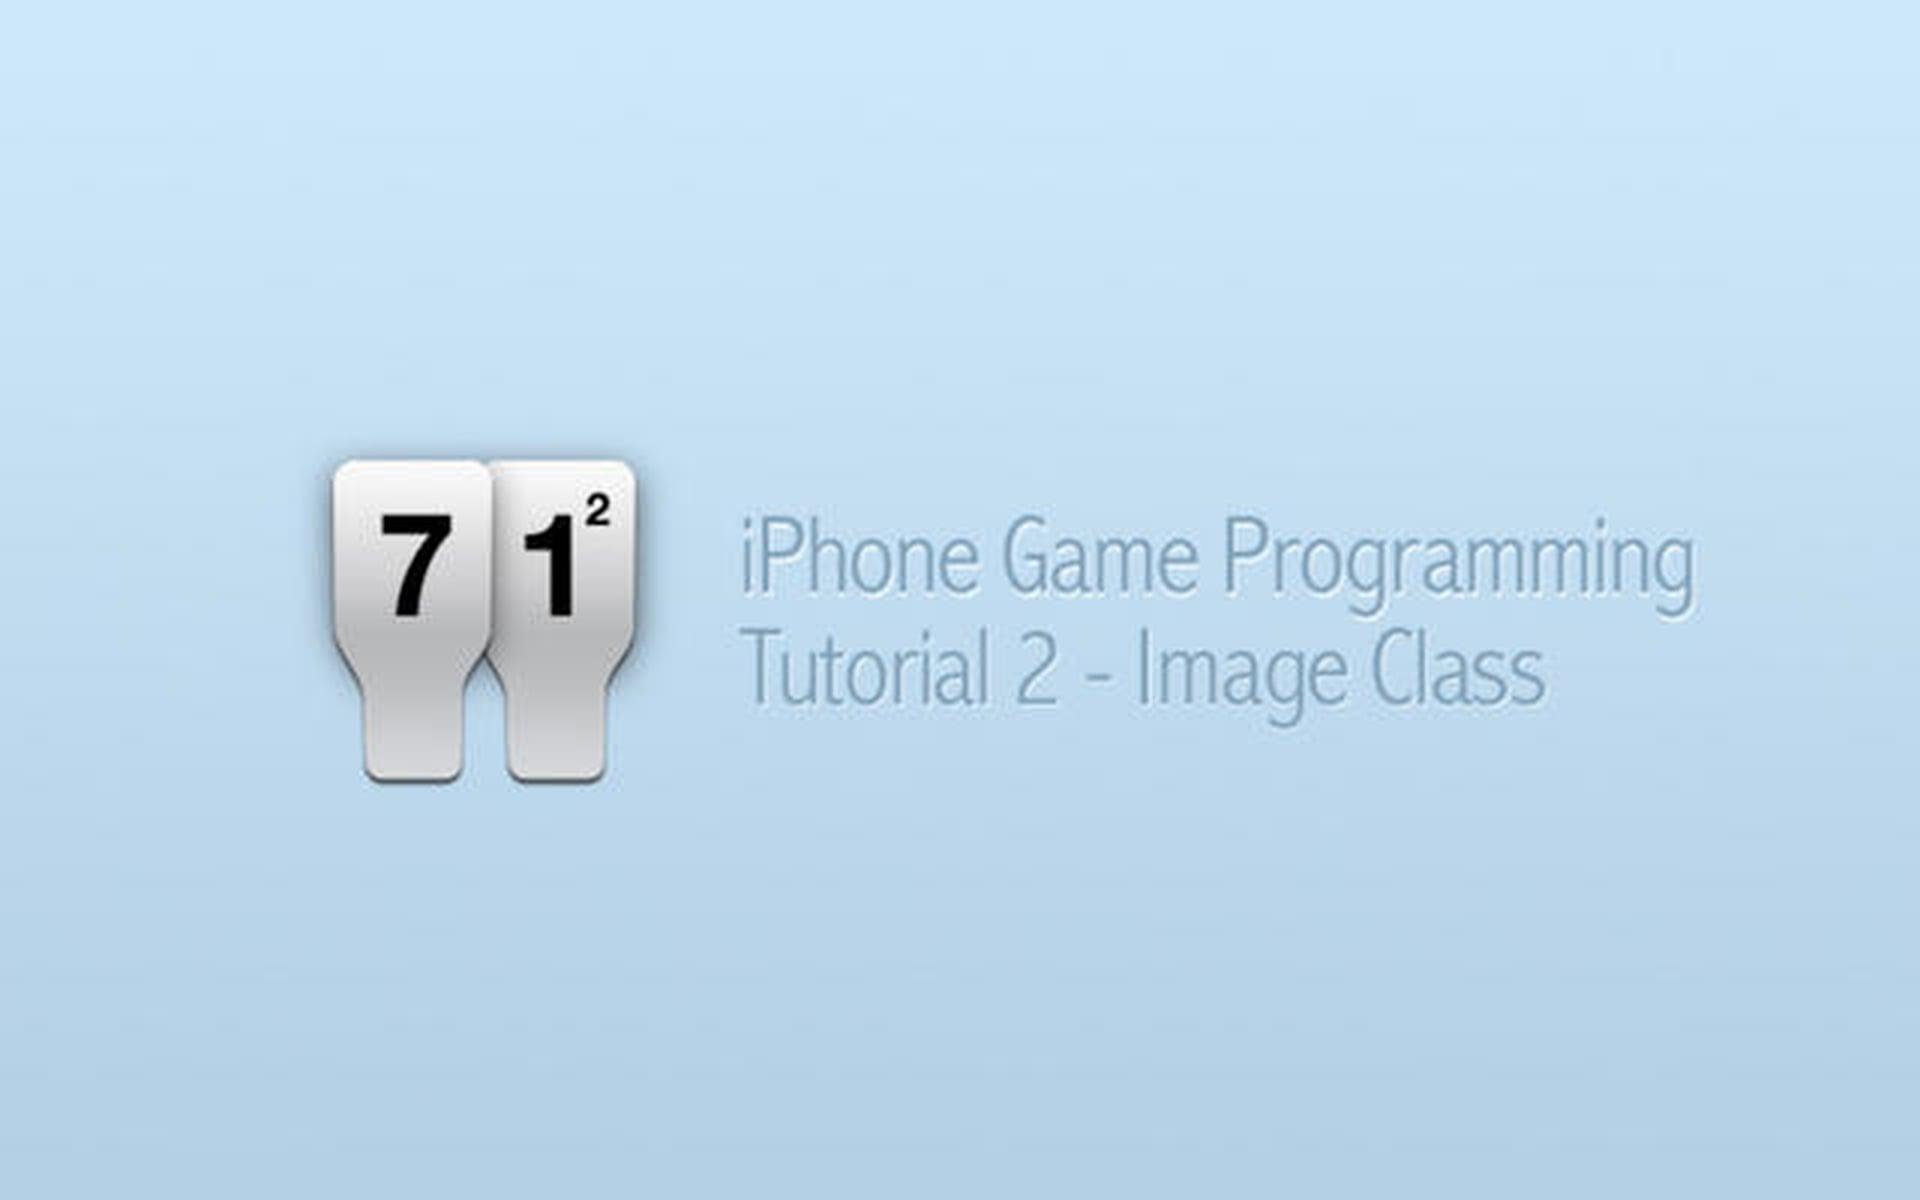 iPhone Game Programming – Tutorial 2 – Image Class